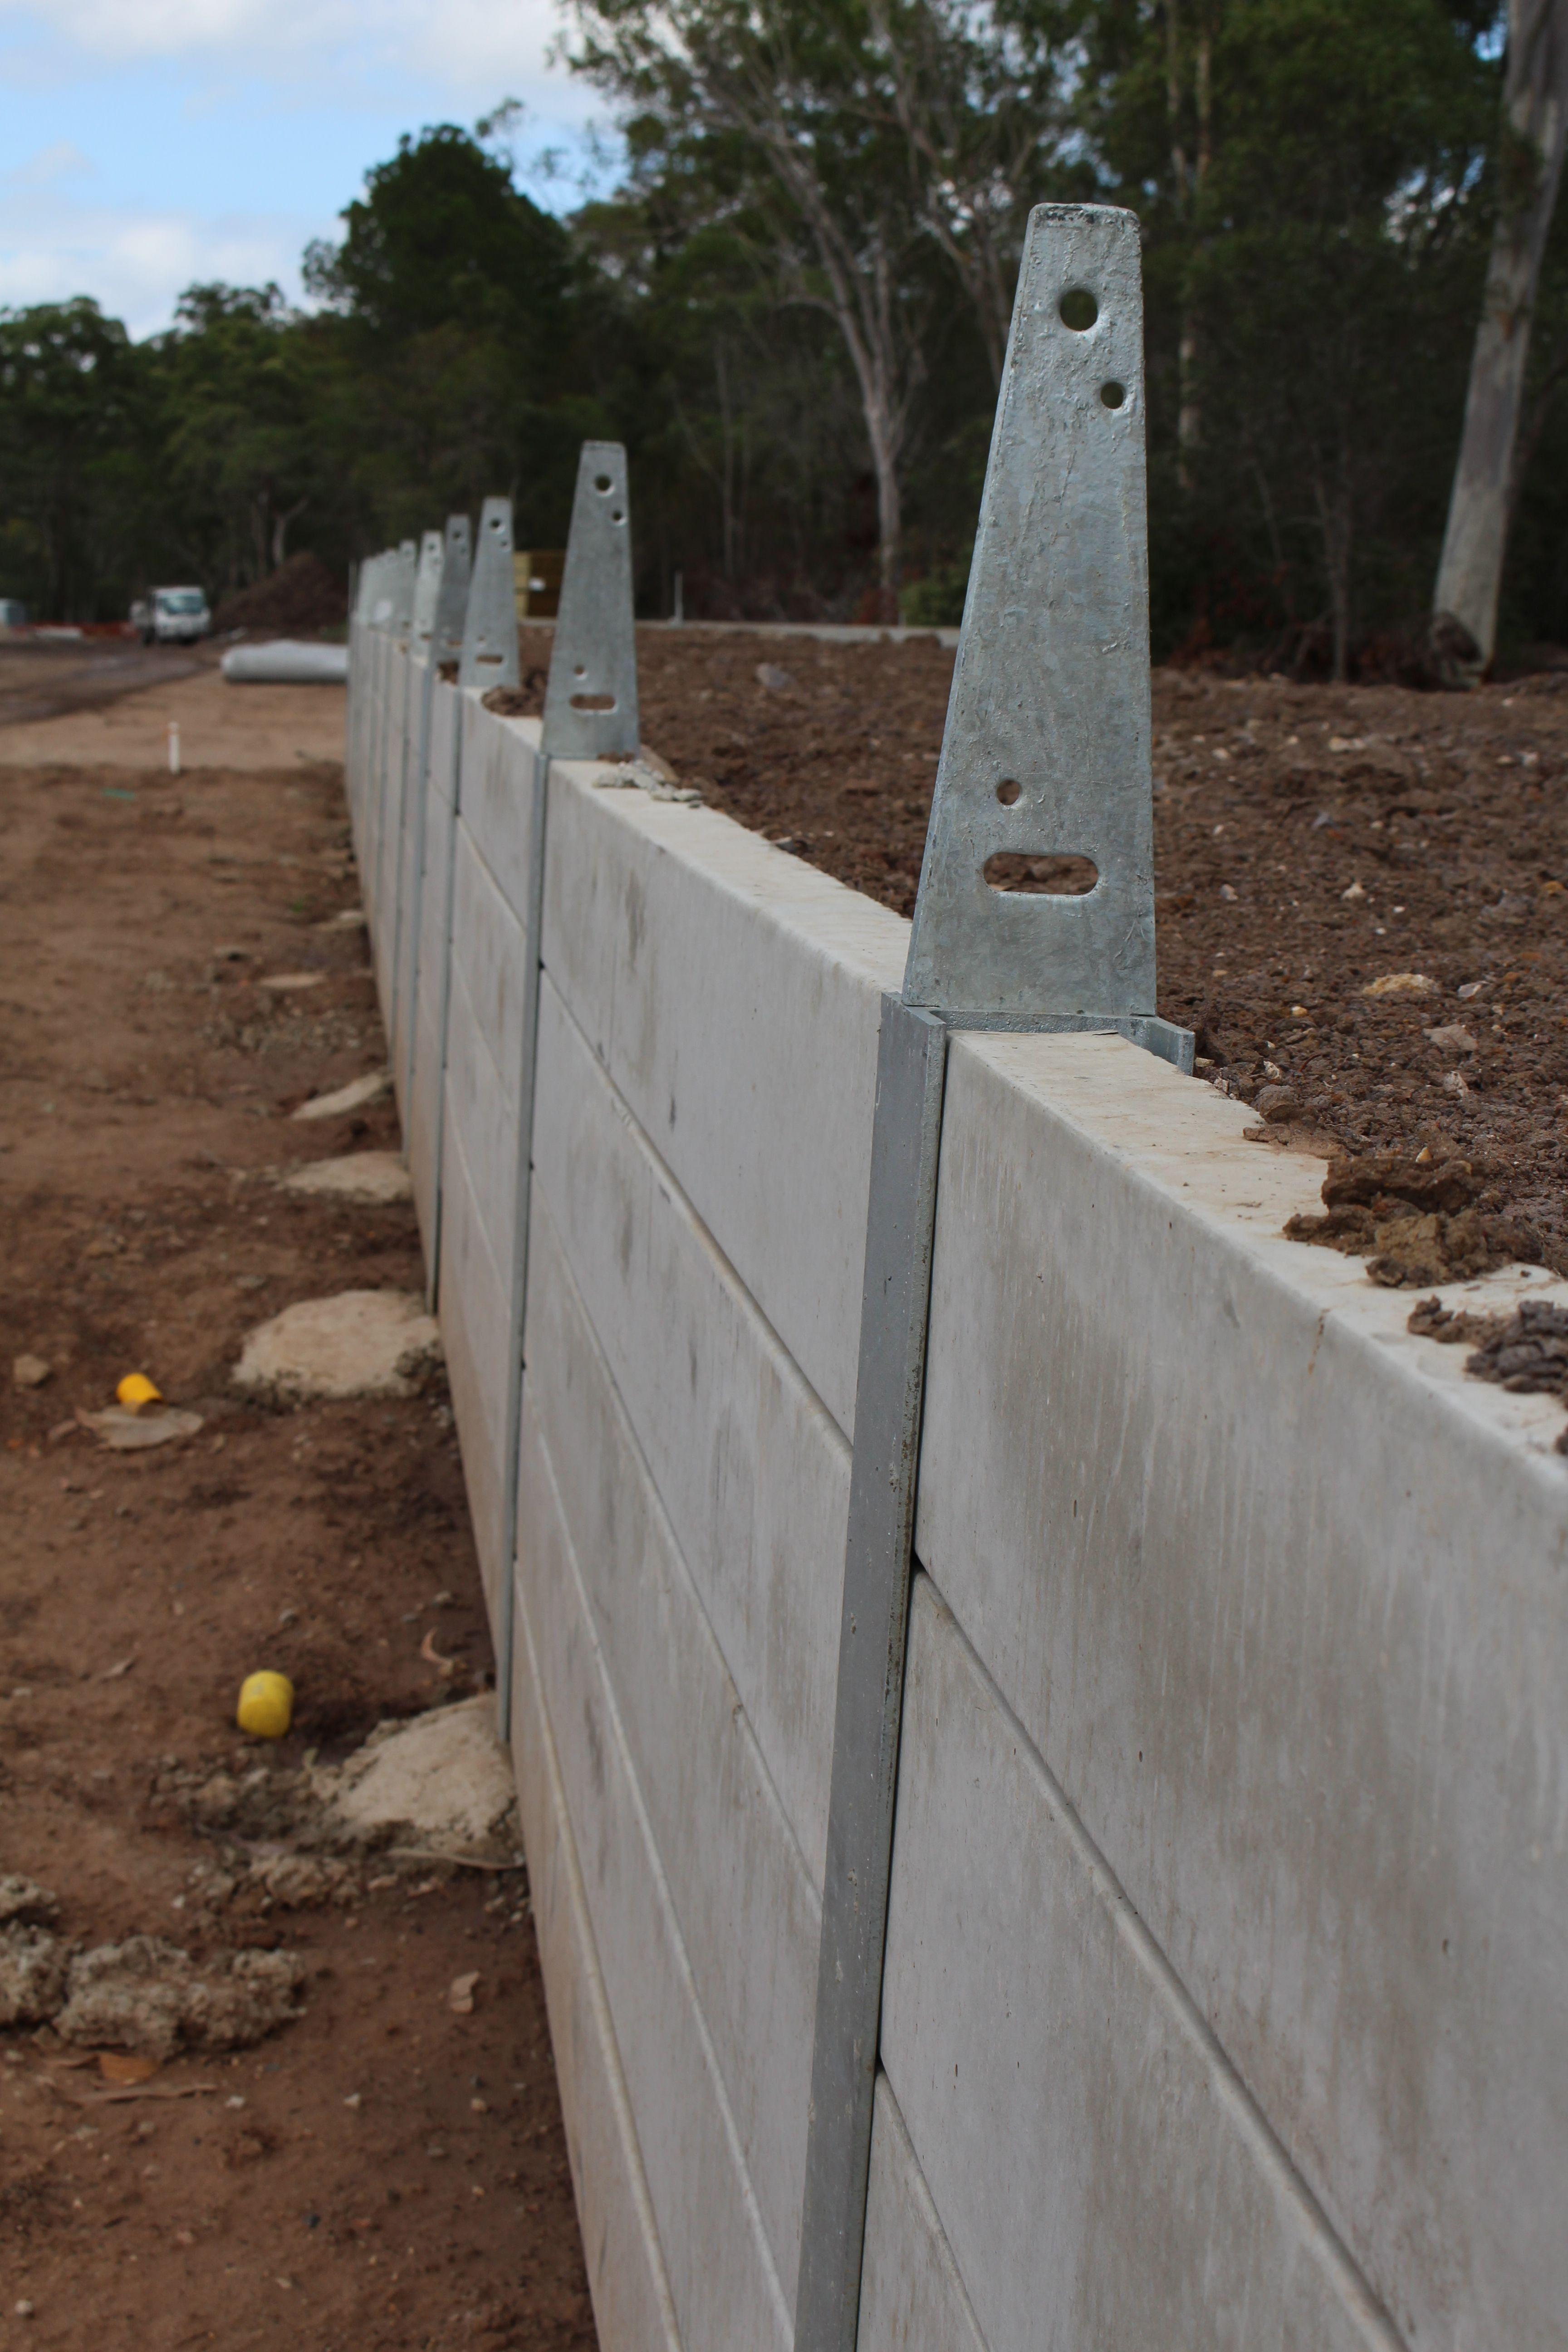 Pioneer Smooth Grey Concrete Sleepers Steel Posts With Fence Concrete Fence Posts Wood Fence Post Backyard Fences